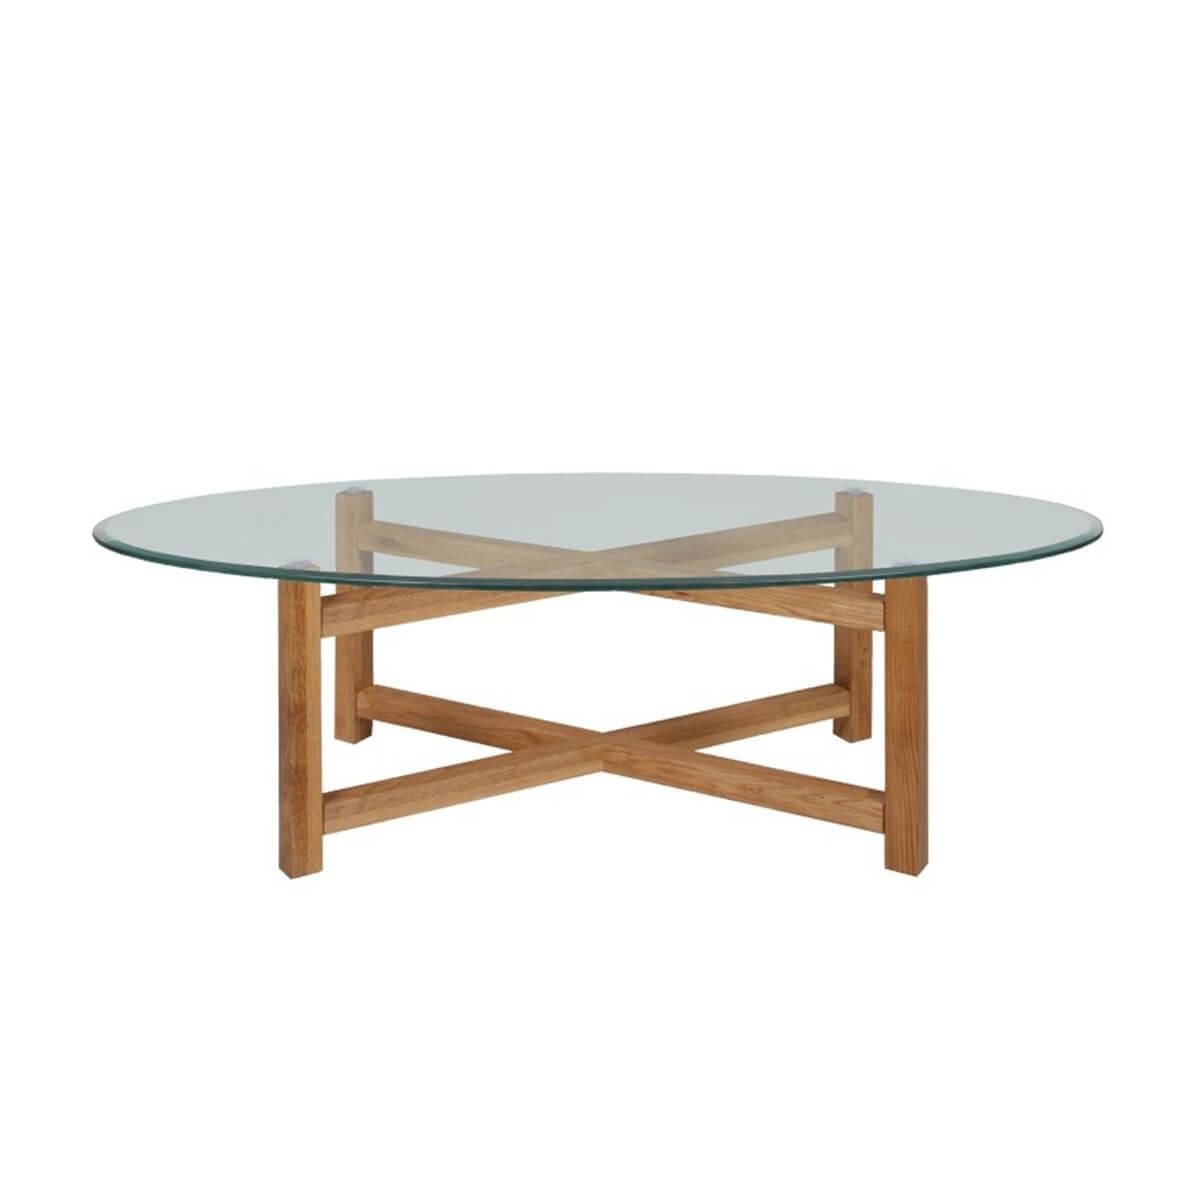 Melia Oval Glass Coffee Table Clear Glass Oak Fads [ 1200 x 1200 Pixel ]